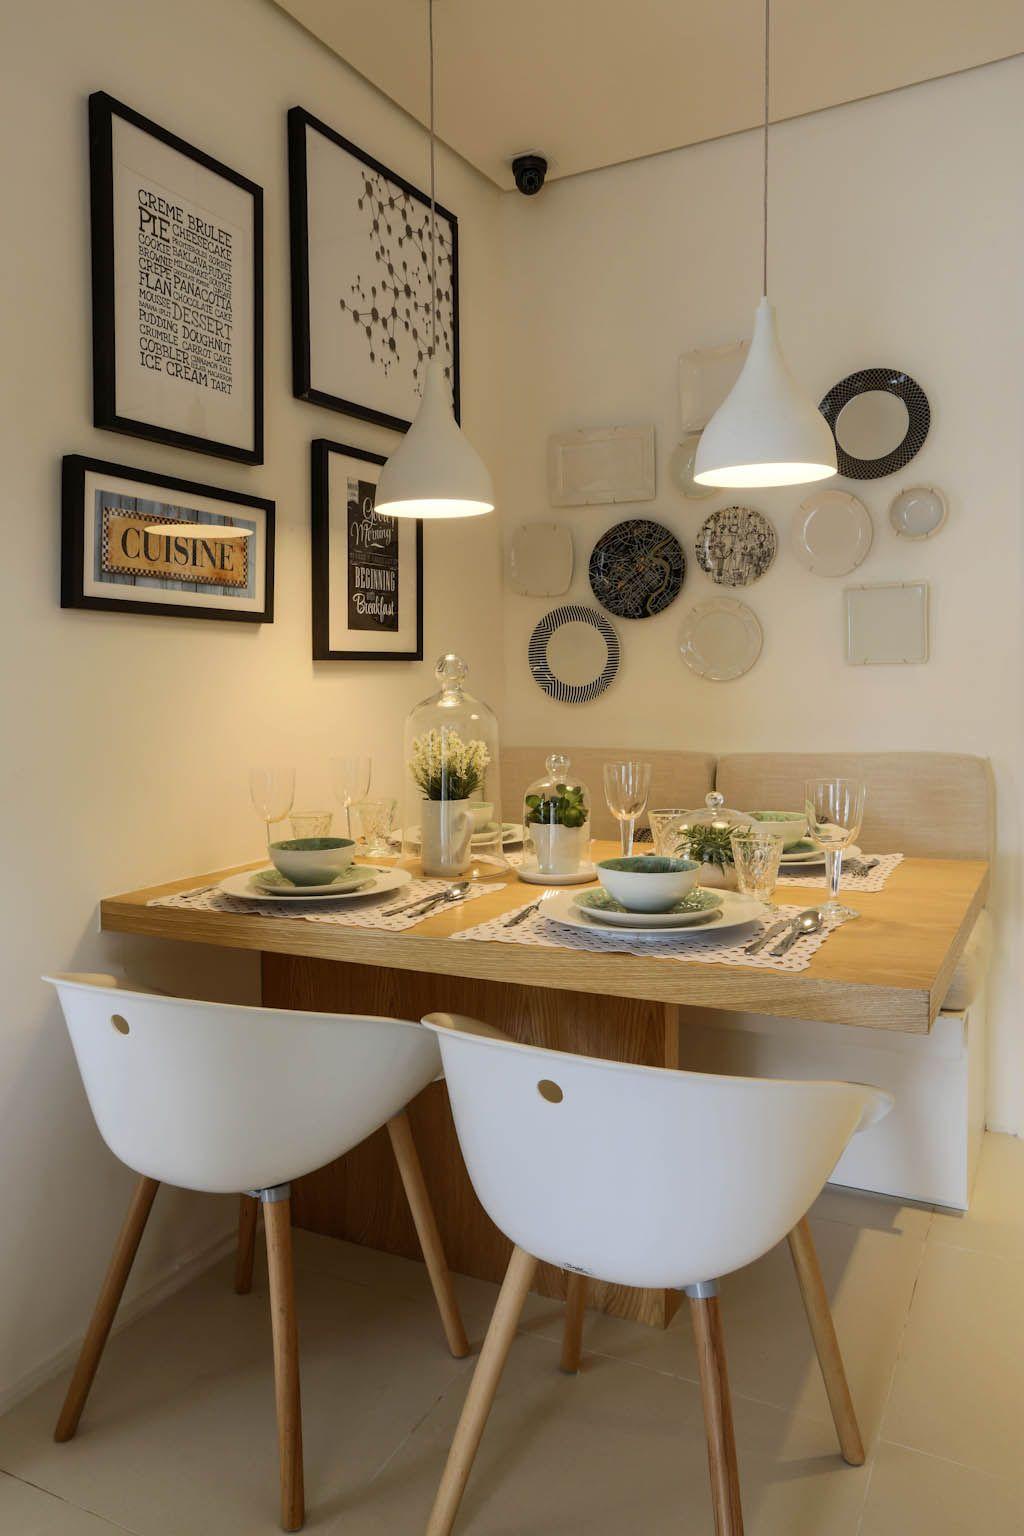 70 Salas De Jantar Pequenas Lindas E Inspiradoras Apartment  -> Salas Com Sala De Jantar Pequena